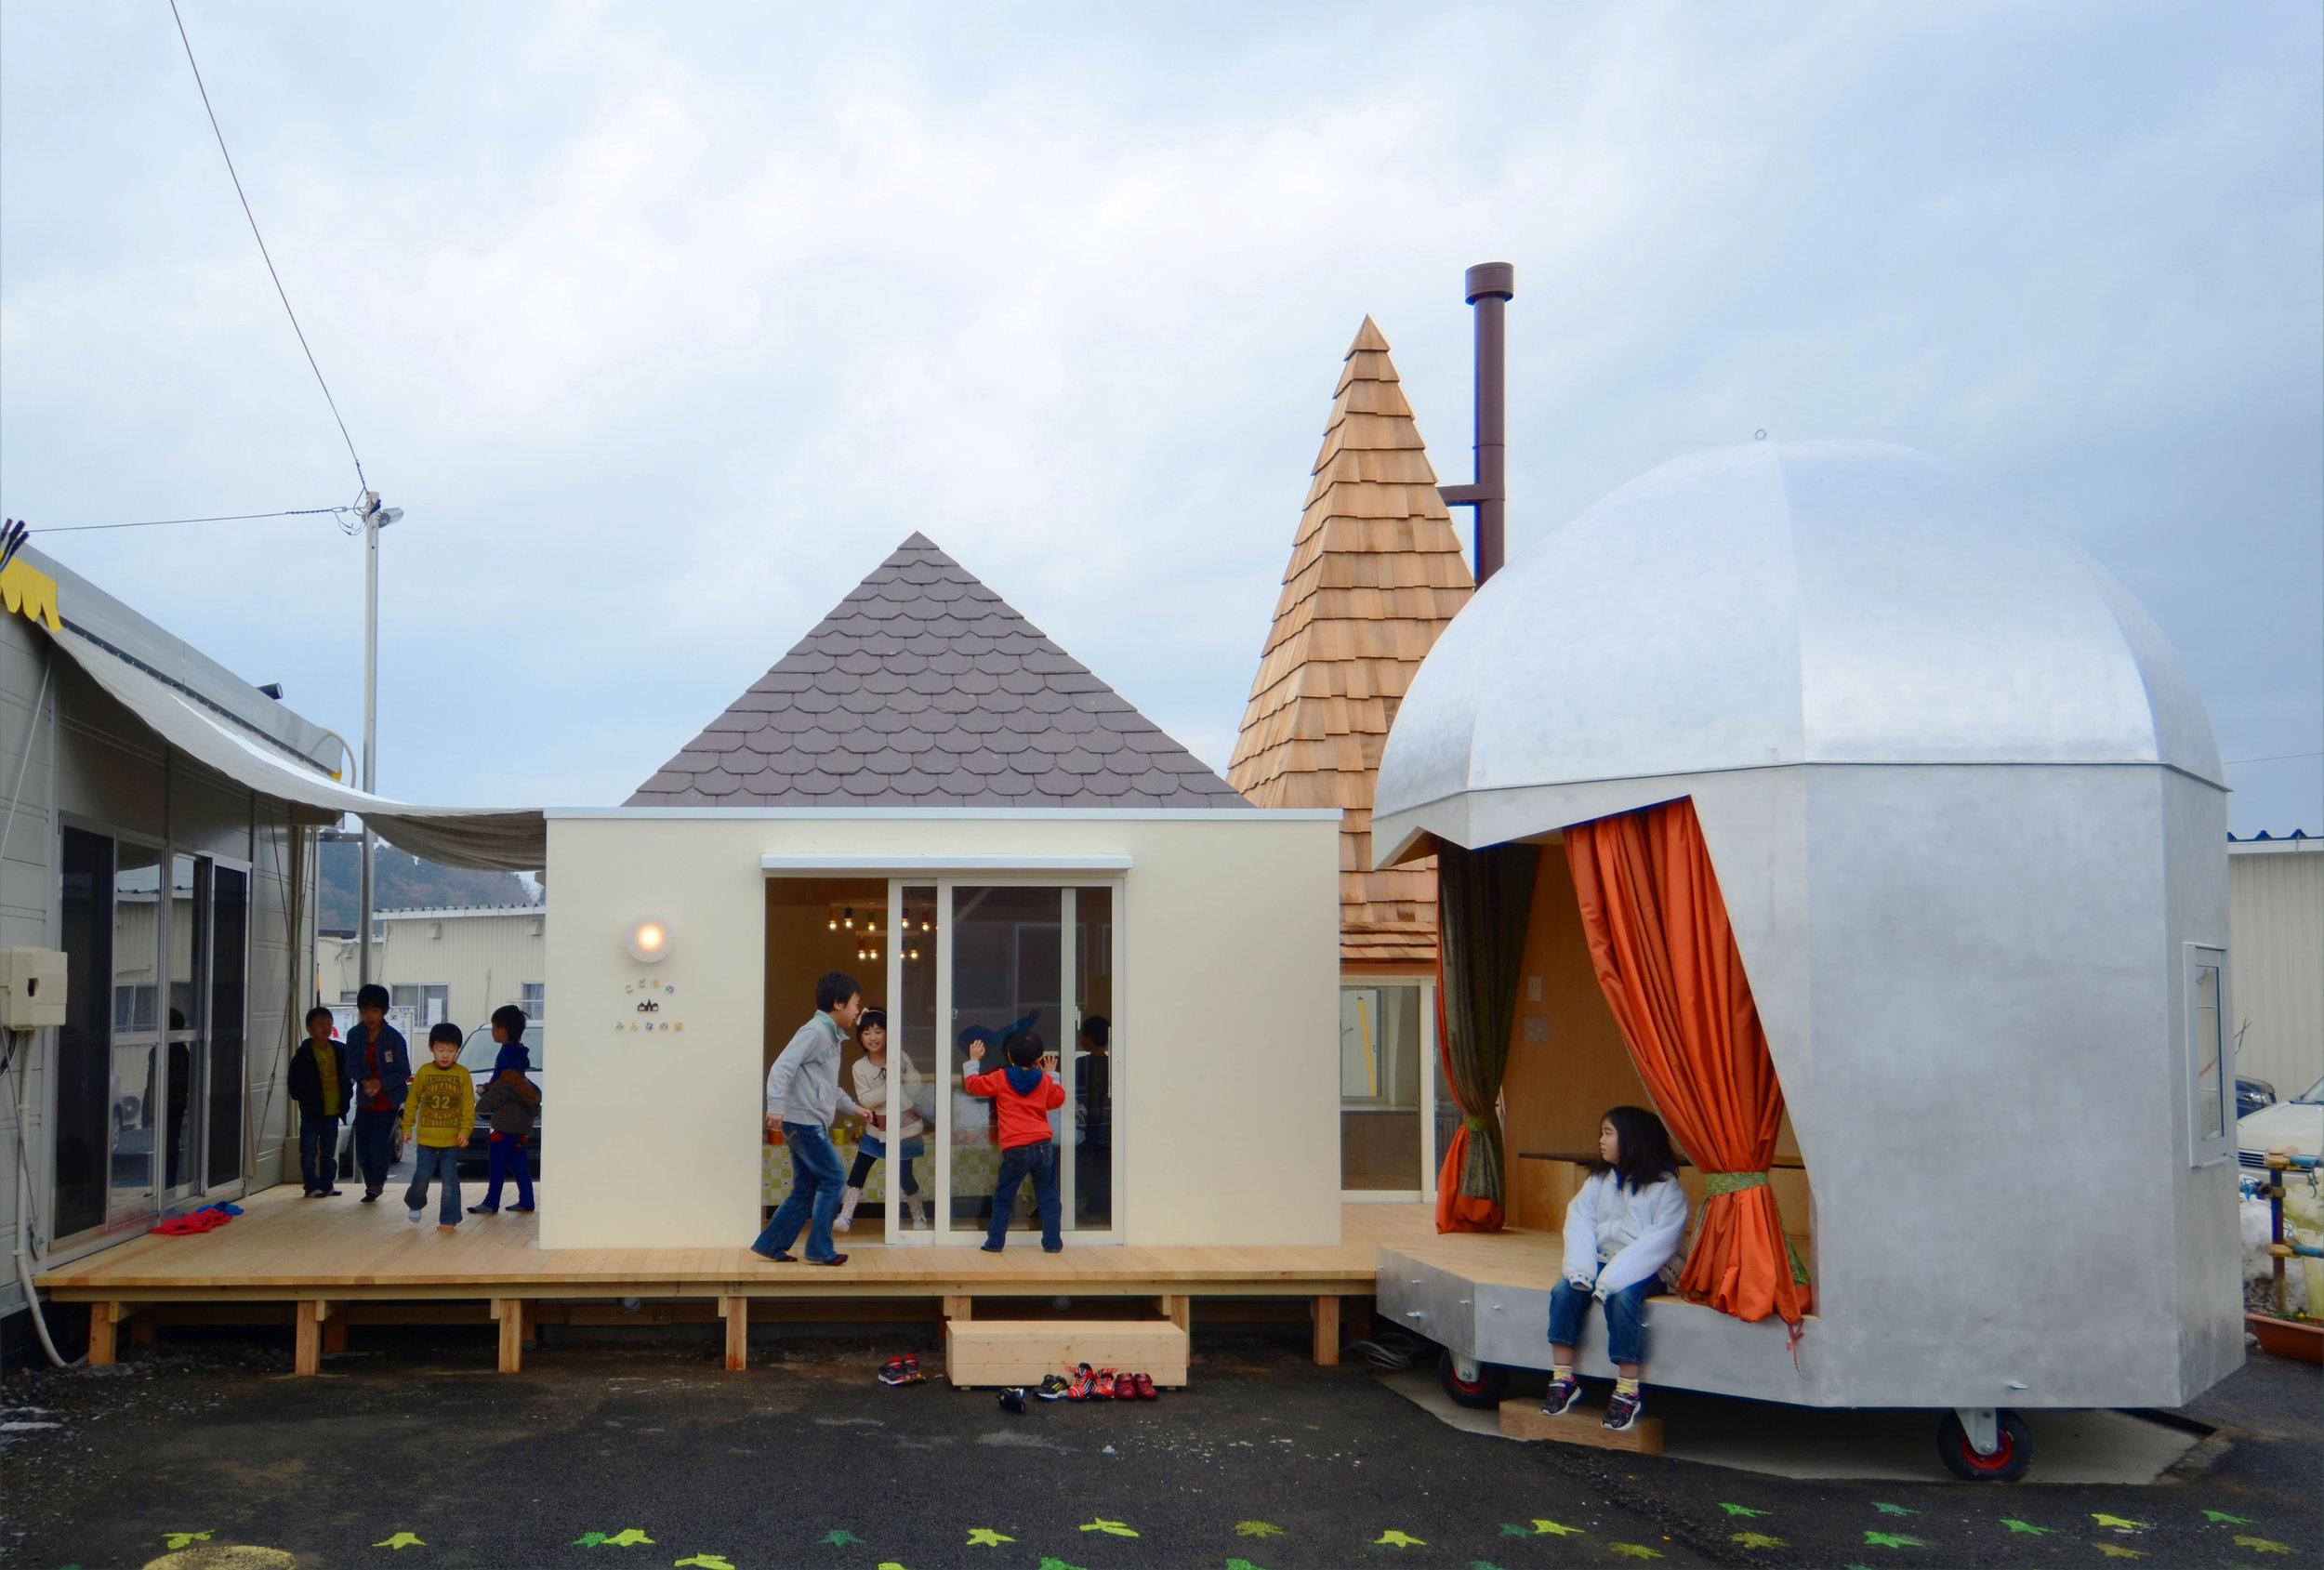 HOME-FOR-ALL IN HIGASHIMATSUSHIMA